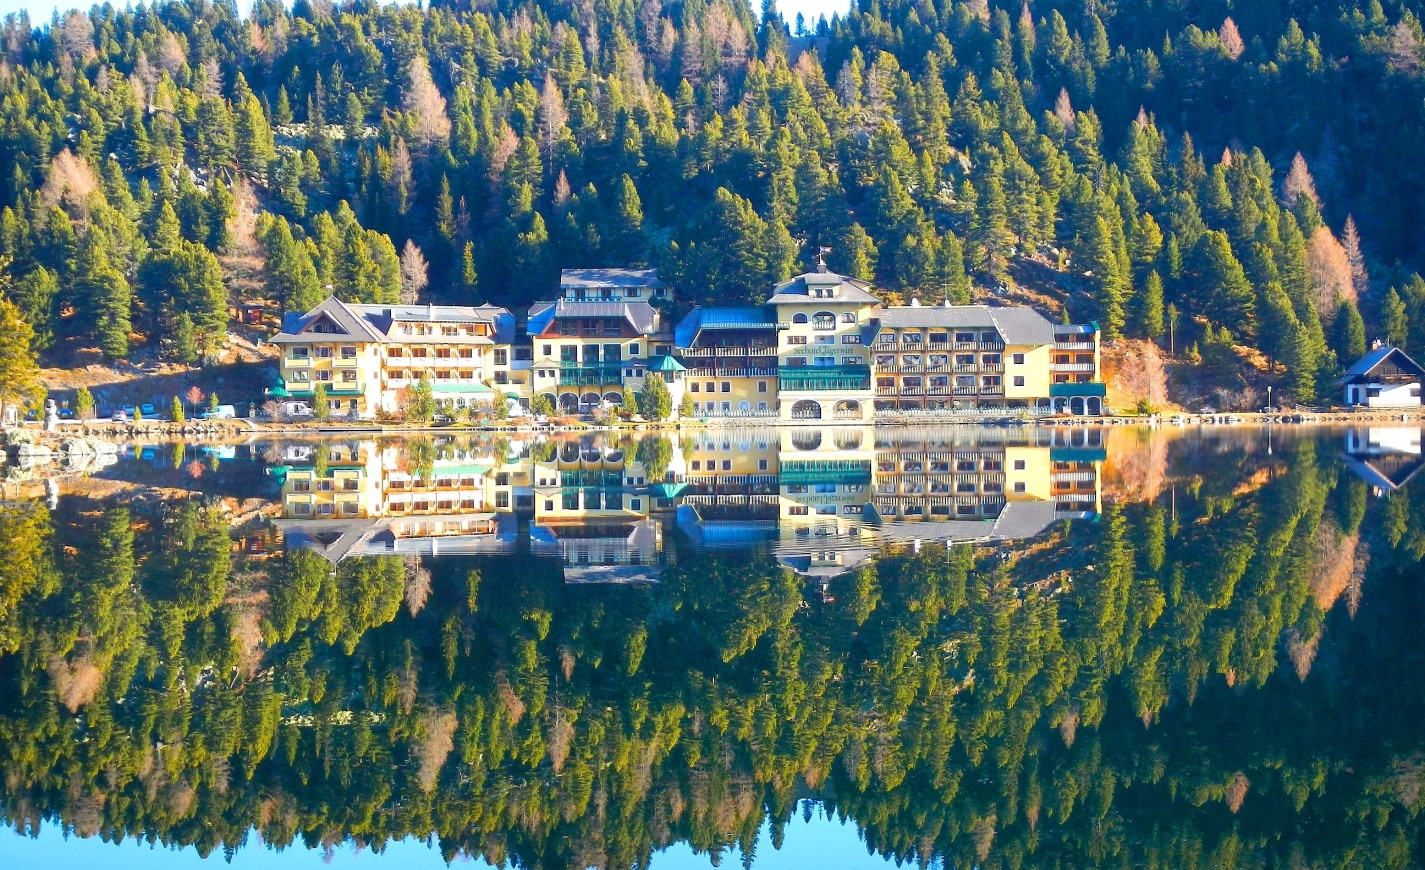 hotel Jägerwirt on Turrach Austria - single parent holiday